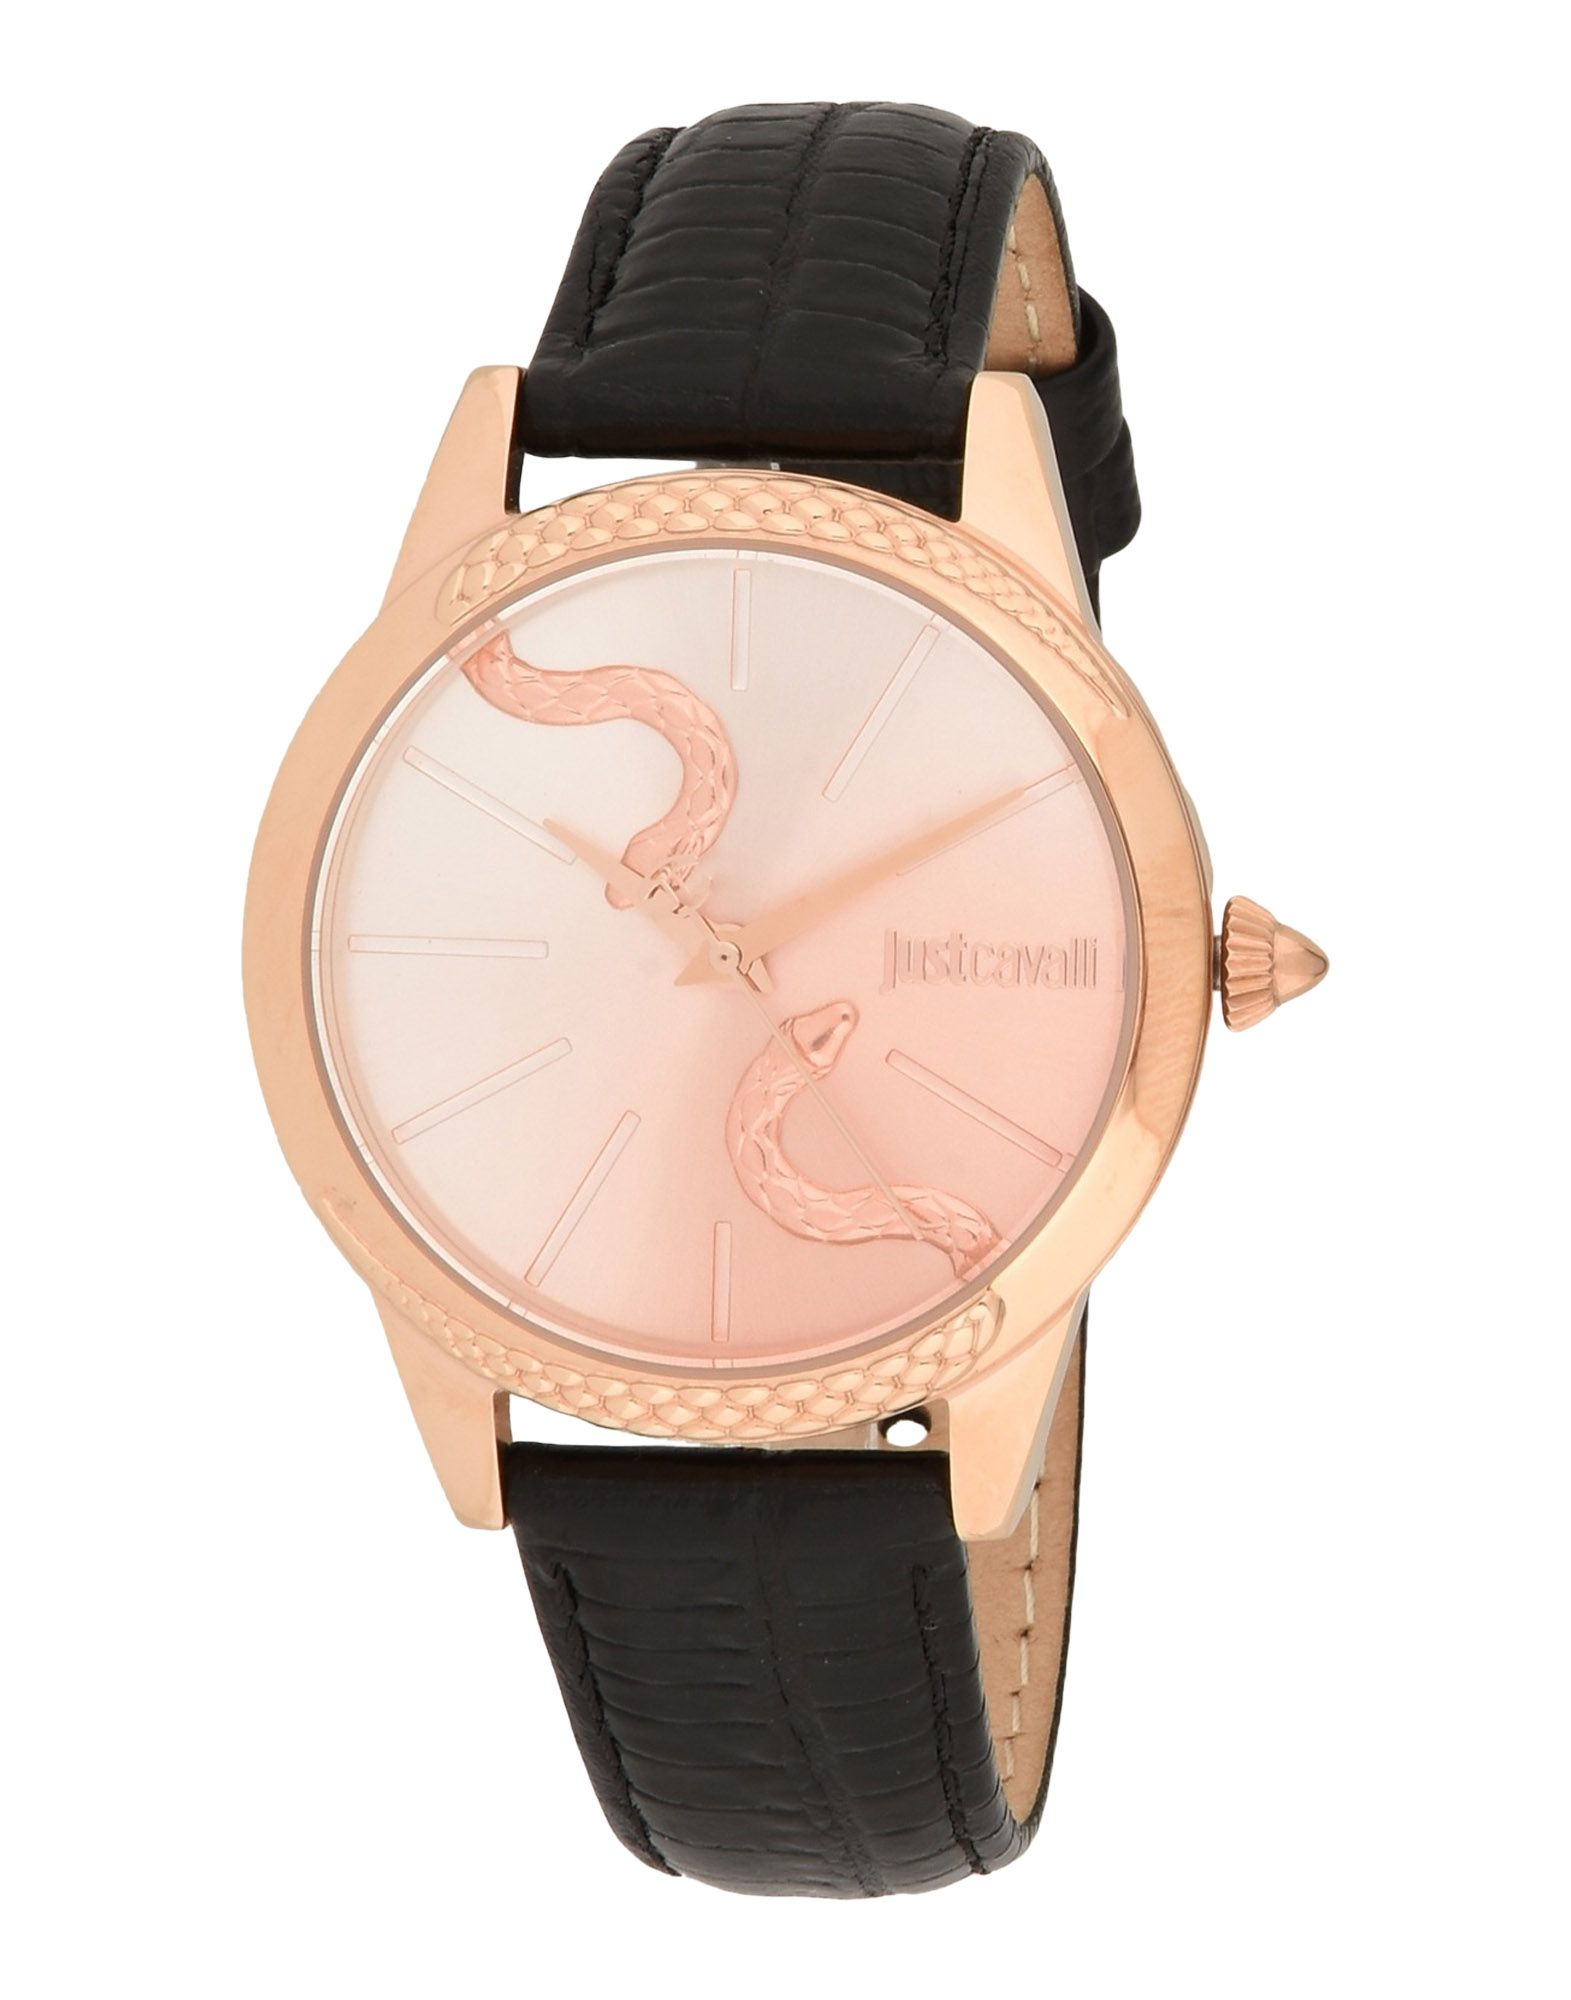 JUST CAVALLI Наручные часы часы relogio feminino мужчины ложная крокодил кожа blu ray часынаручные часы